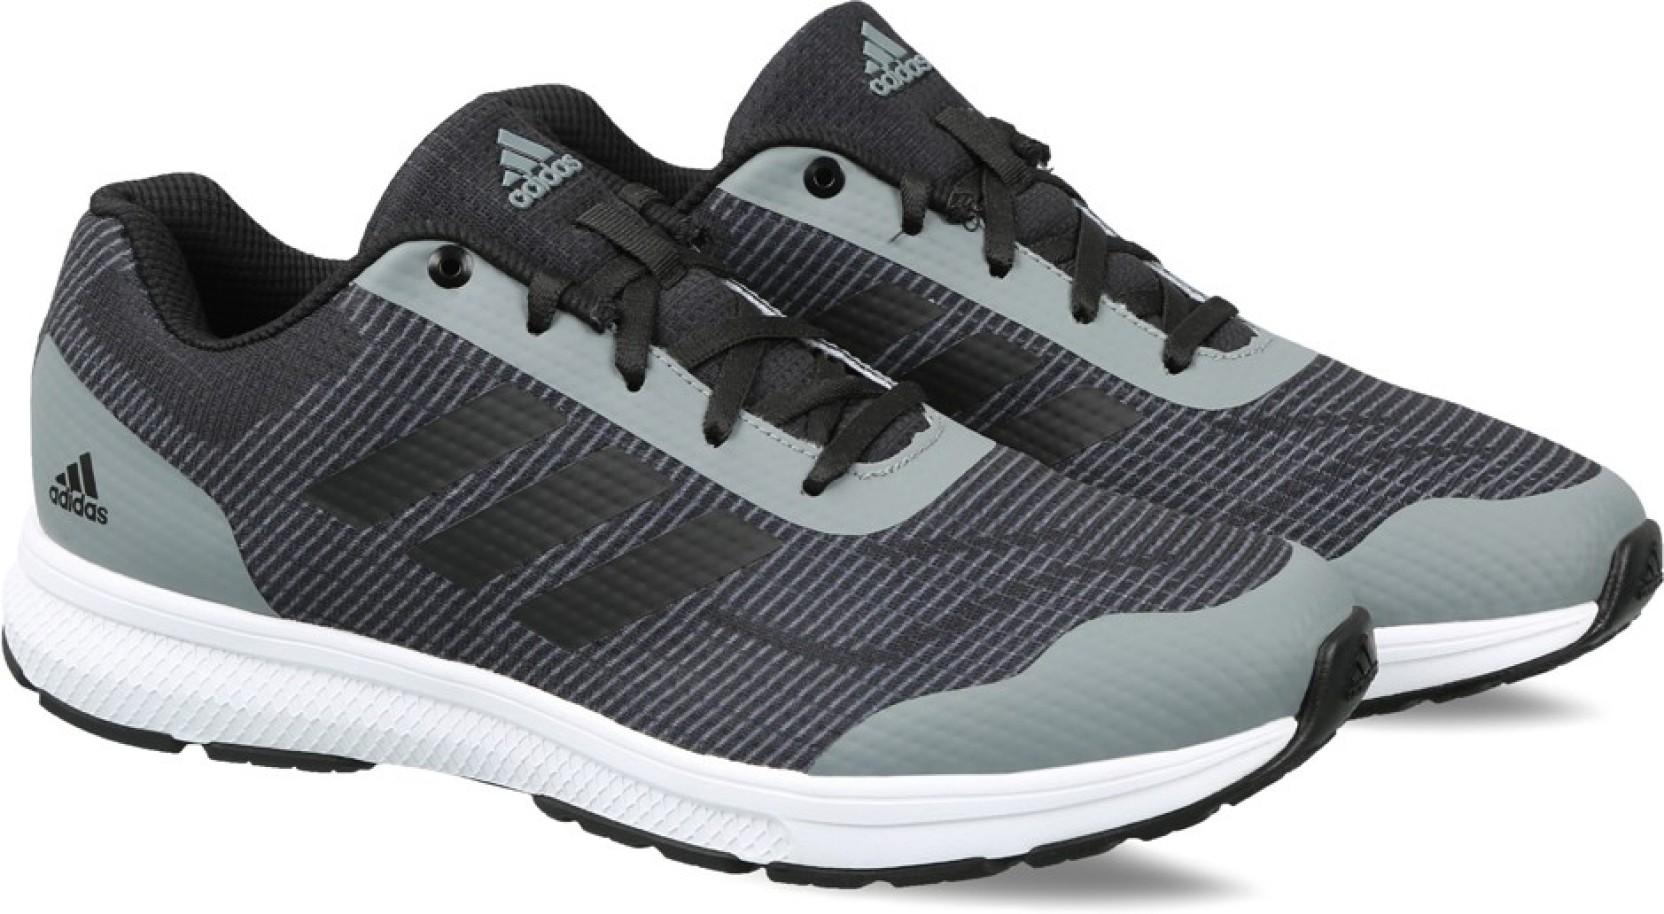 Adidas Men For Visgrecblackvisgre Running Buy Shoes Raddis M qrBAIgxwrX